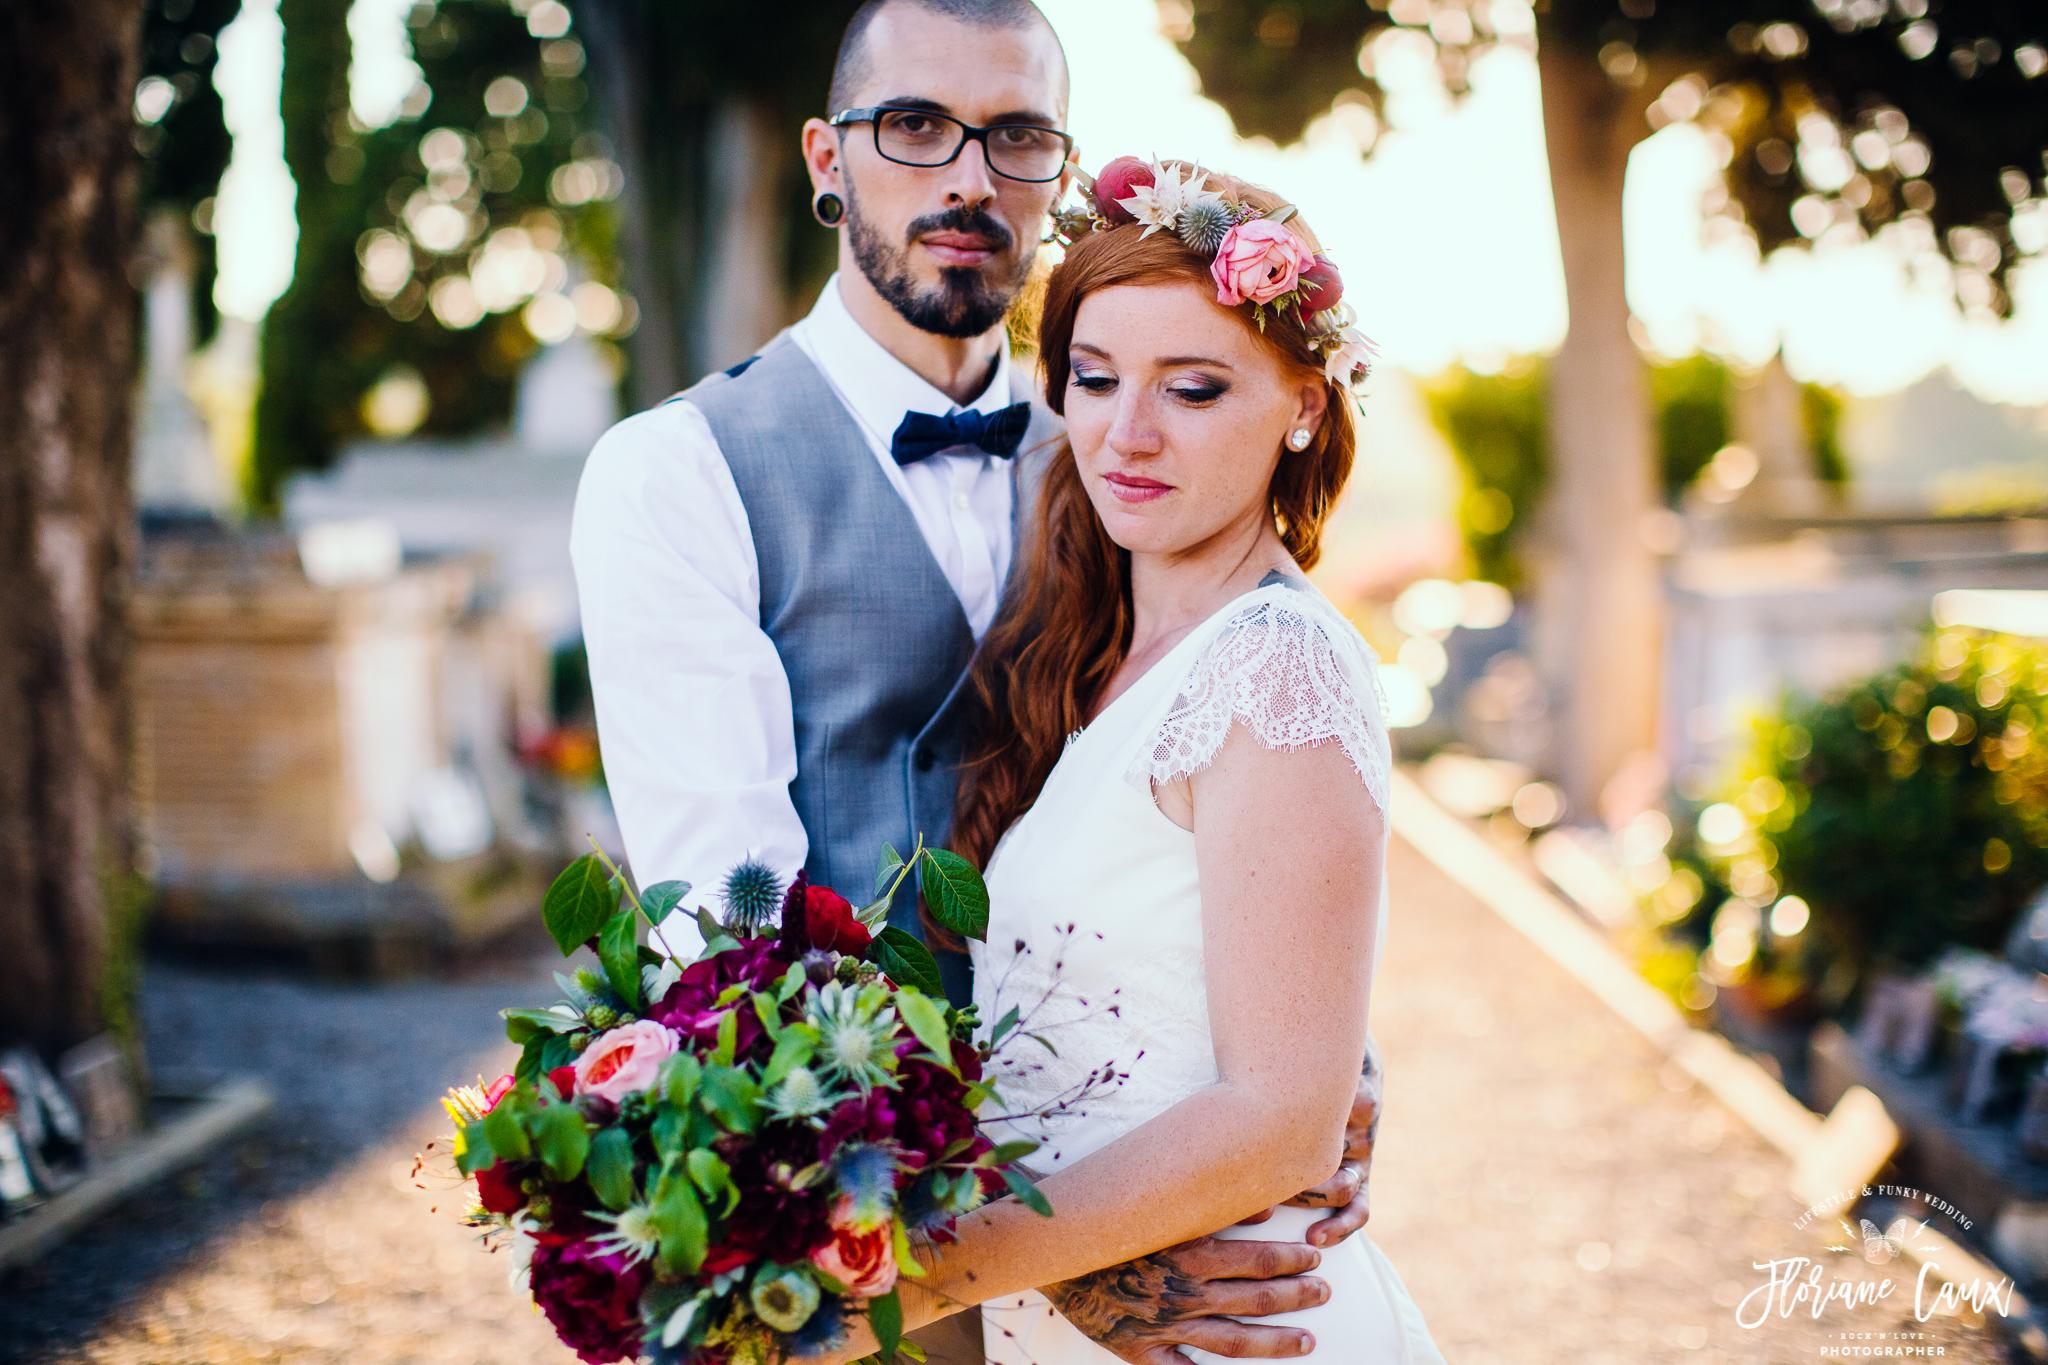 photographe-mariage-toulouse-rocknroll-maries-tatoues-floriane-caux-55